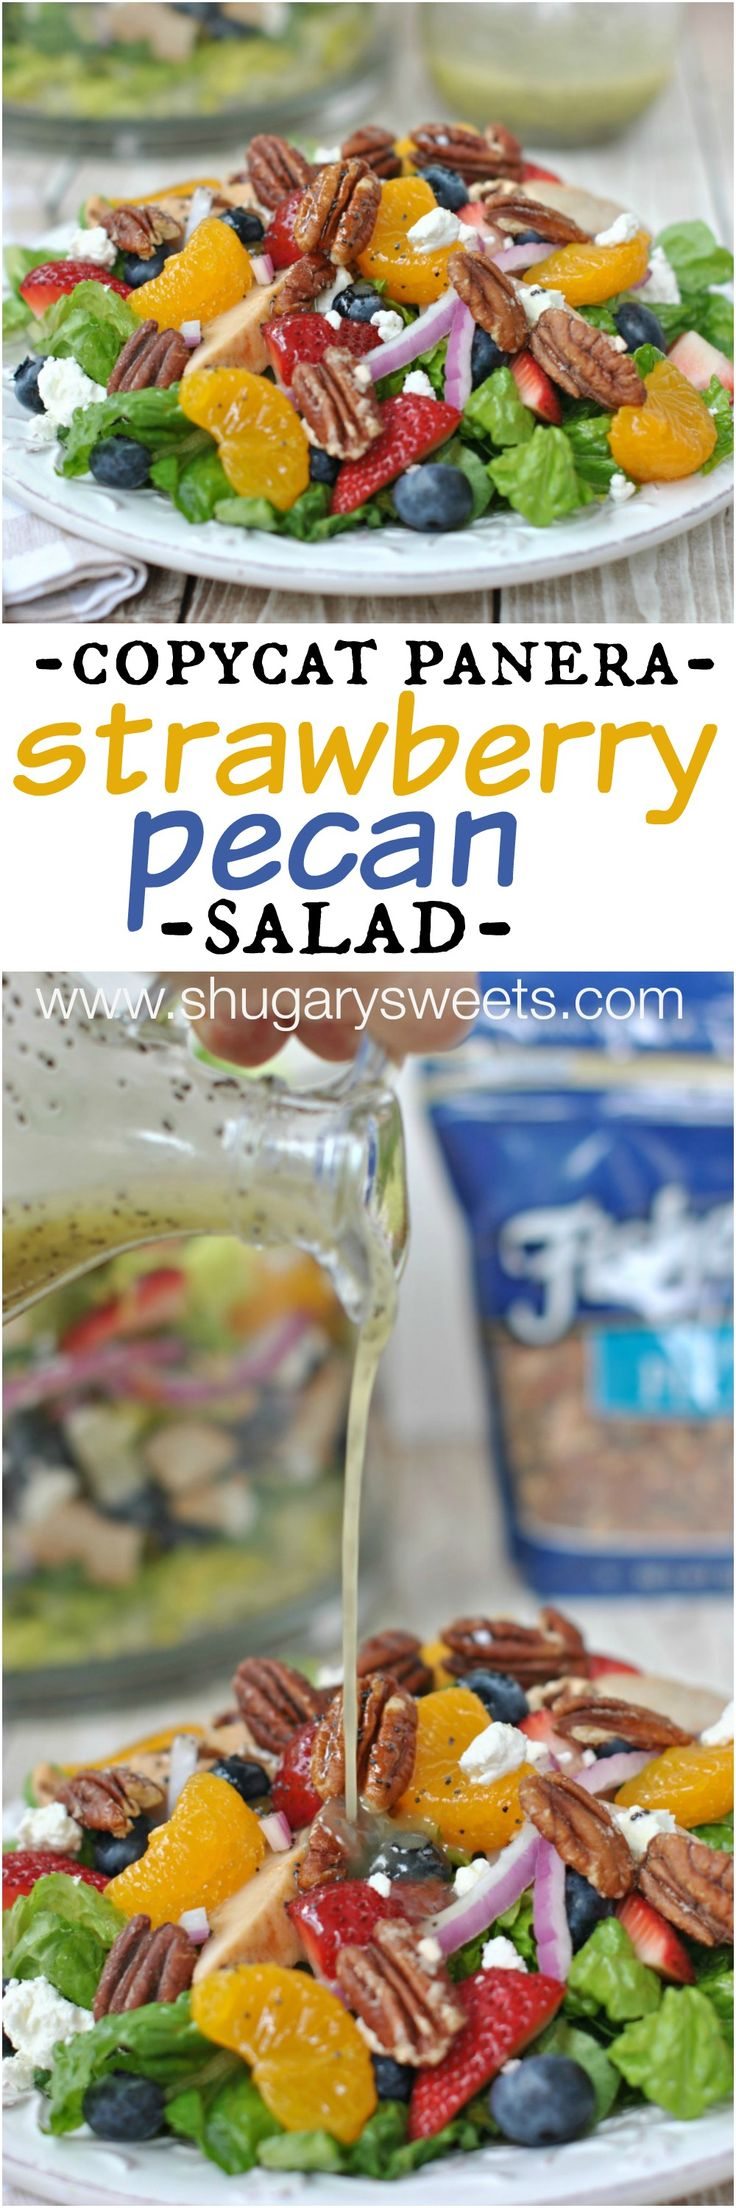 Strawberry Pecan Salad - Shugary Sweets